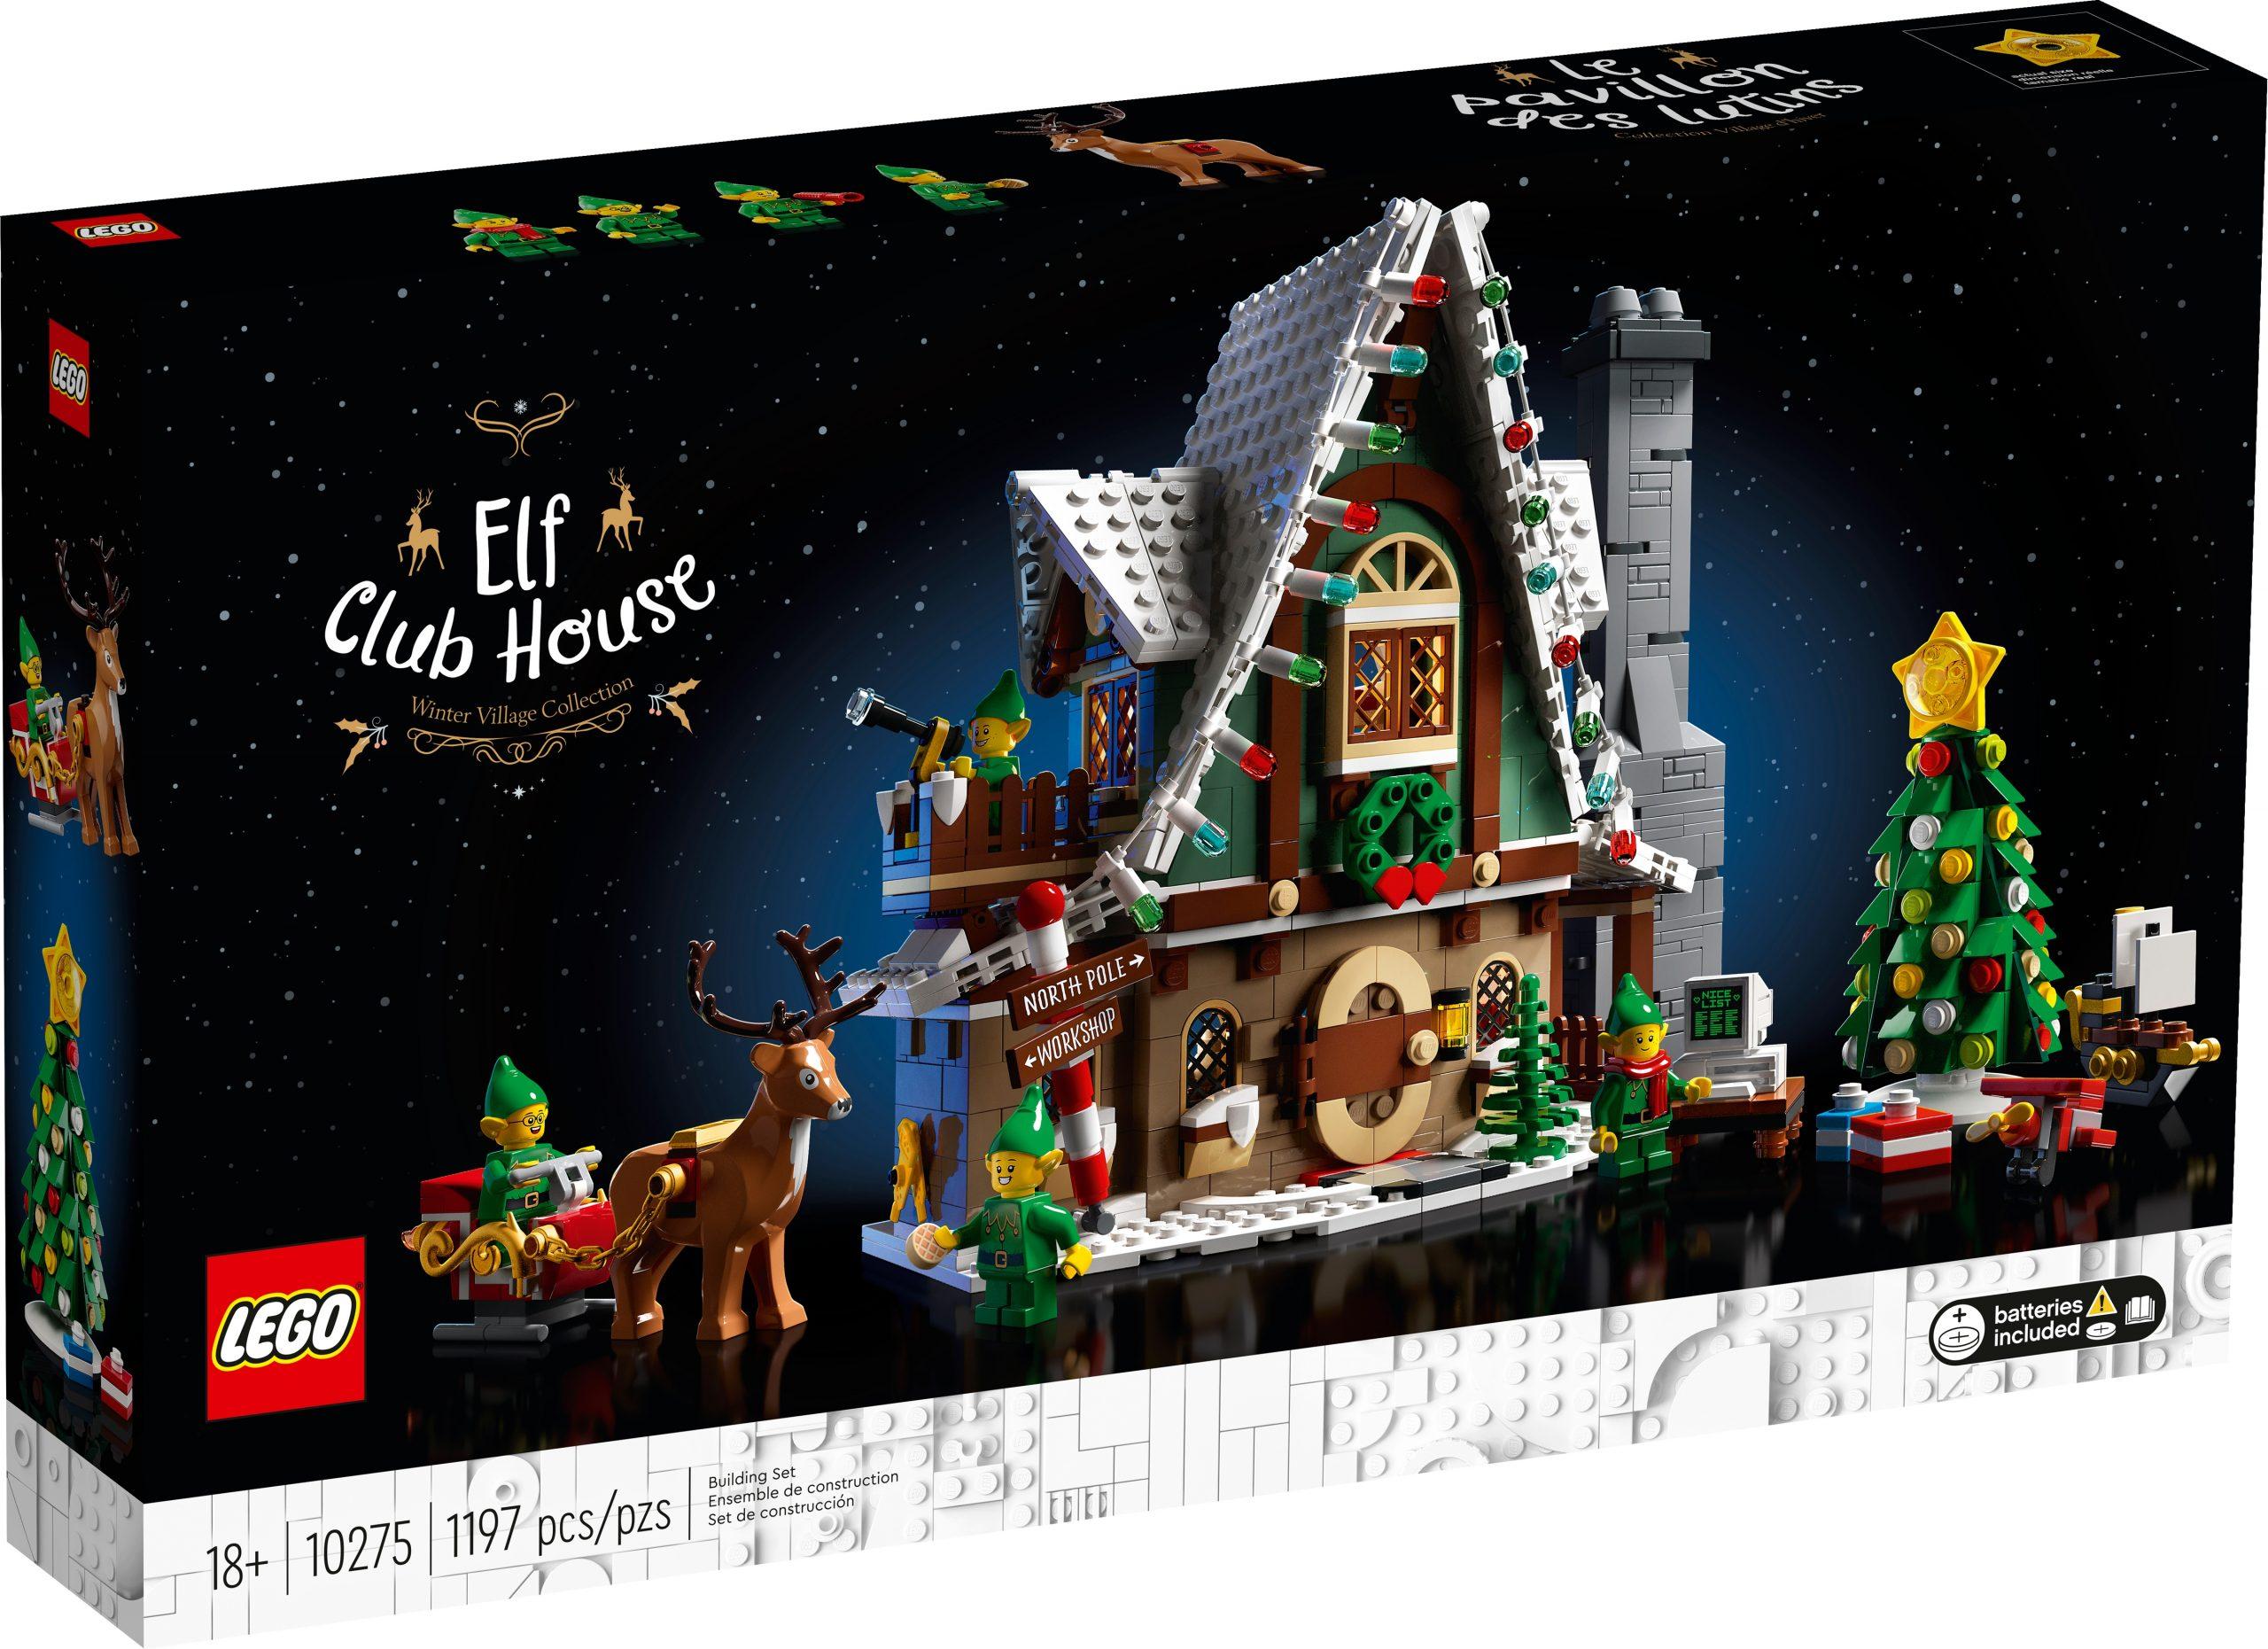 lego 10275 la casa degli elfi scaled